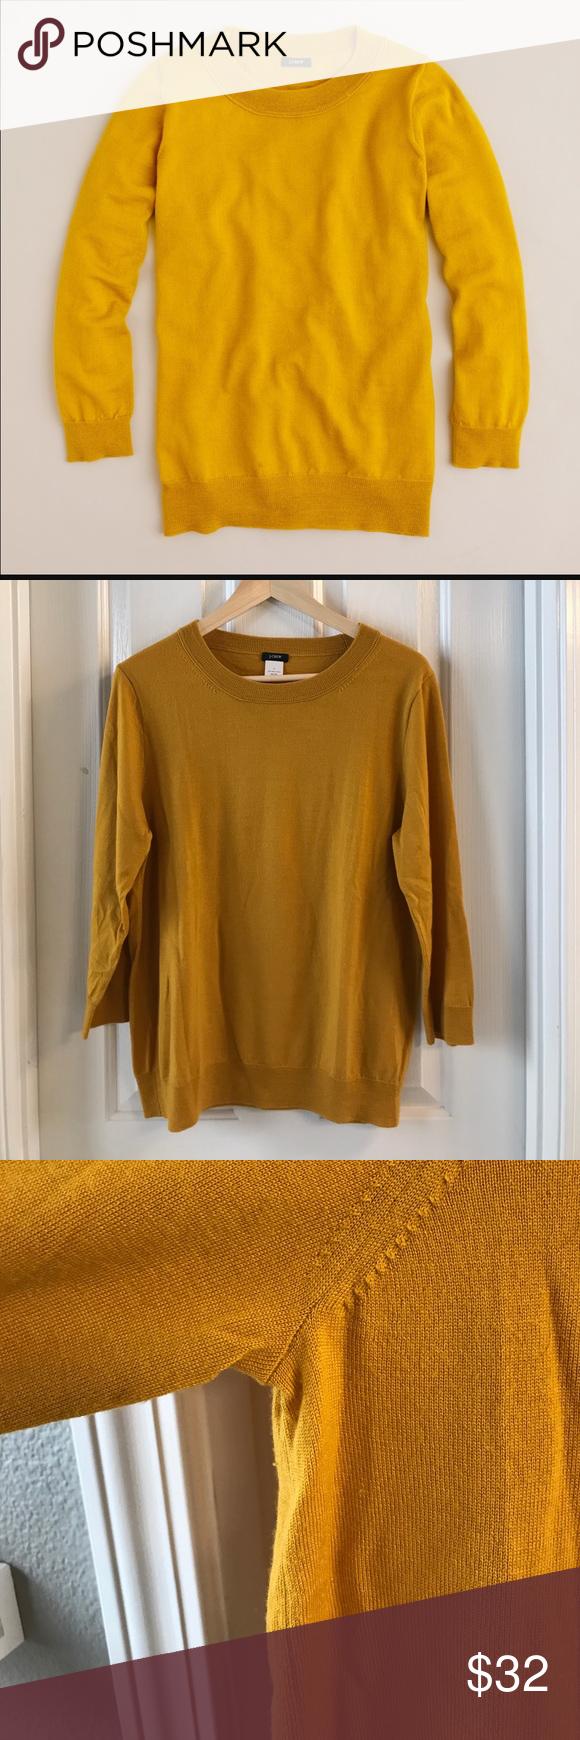 J. Crew Tippi Sweater Yellow/Gold colored 100% merino wool sweater ...